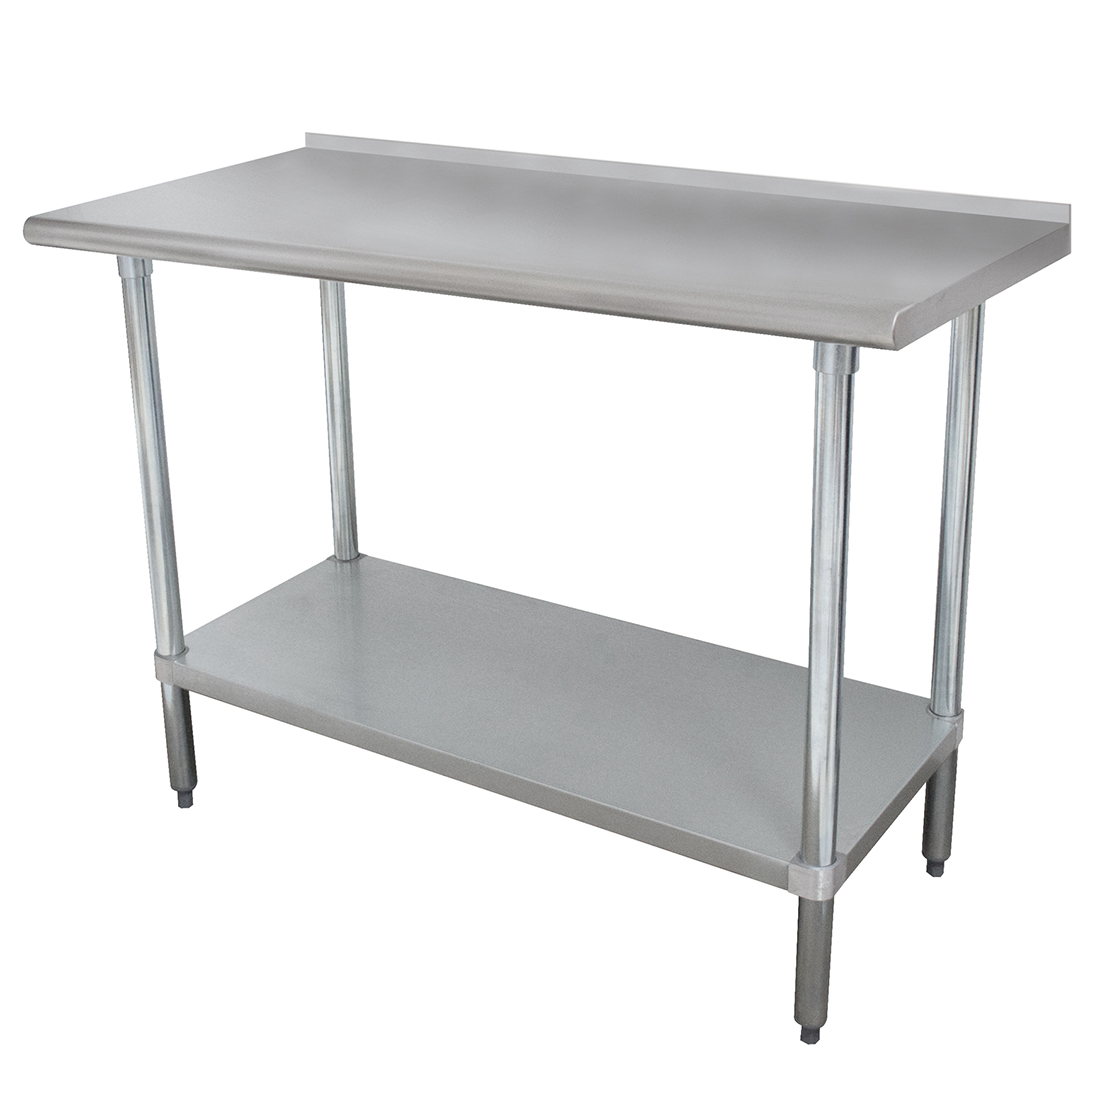 Advance Tabco FLG-365 work table,  54